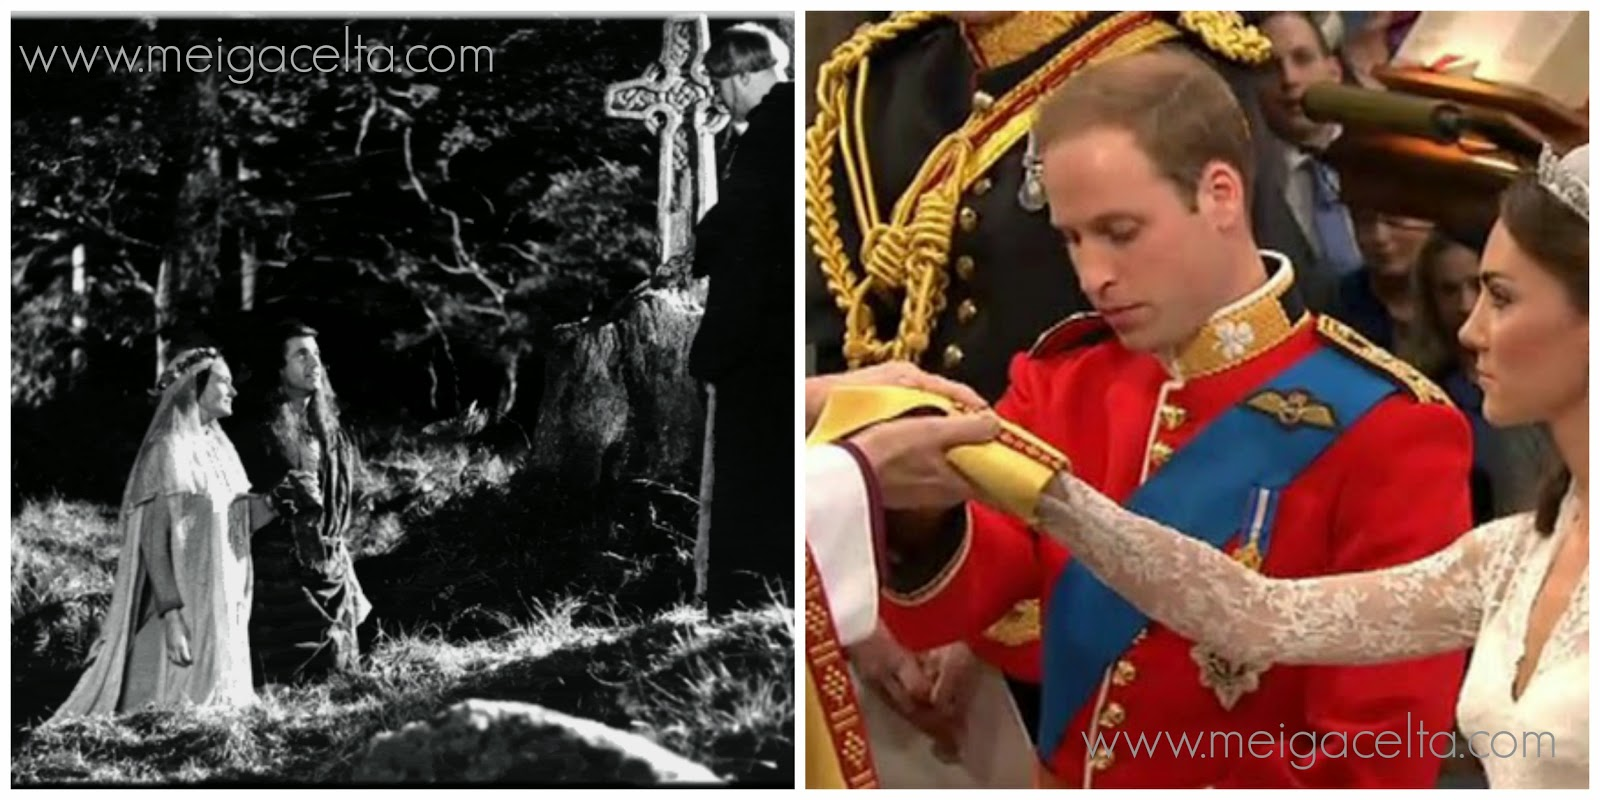 Braveheart Prince William Kate Midleton wedding handfasting unión de manos